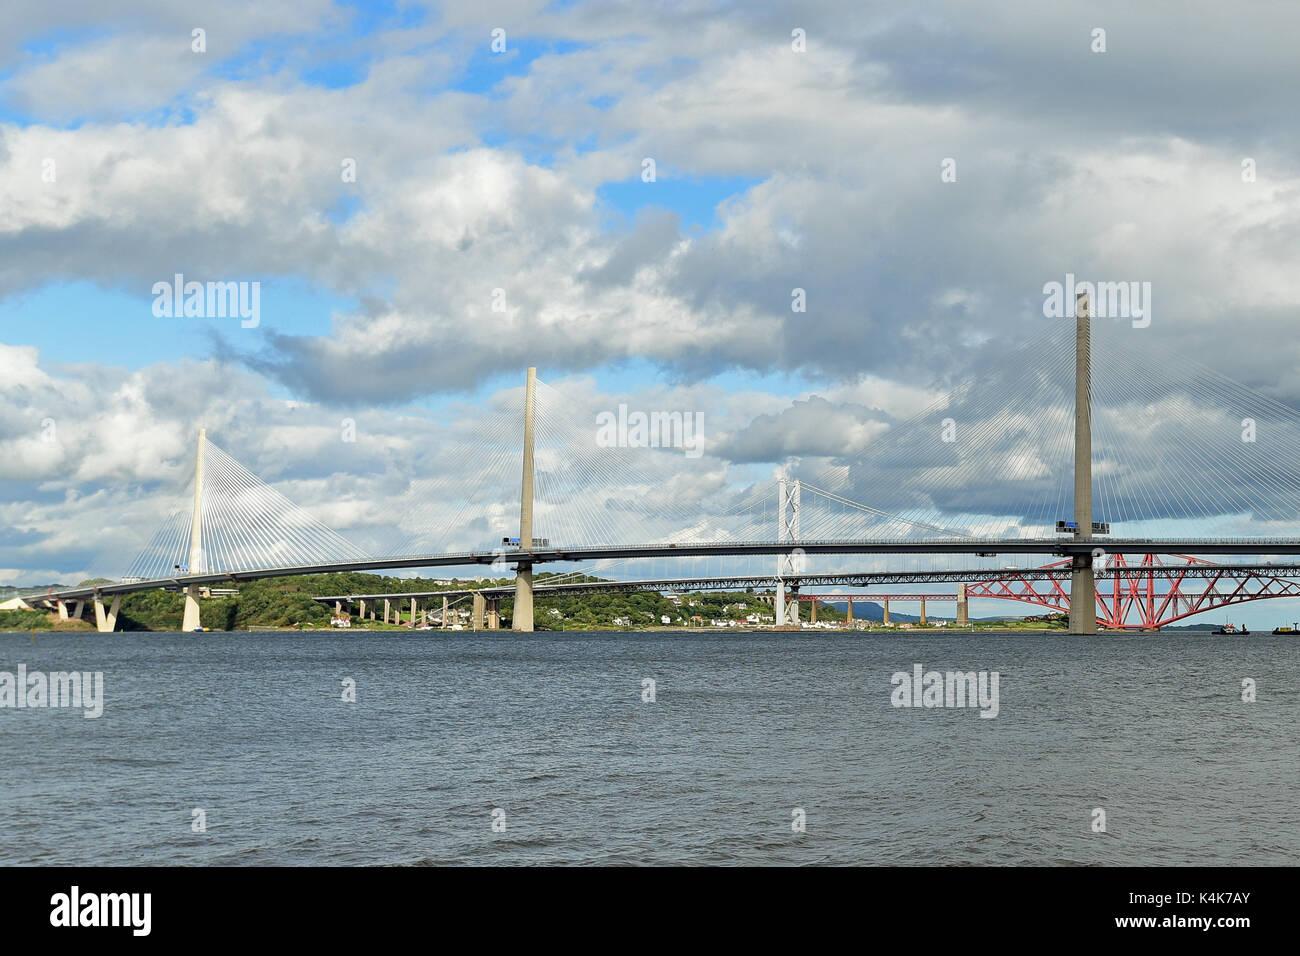 Edinburgh, Scotland, United Kingdom, 06, September, 2017. The new Queensferry Crossing road bridge over the Forth - Stock Image